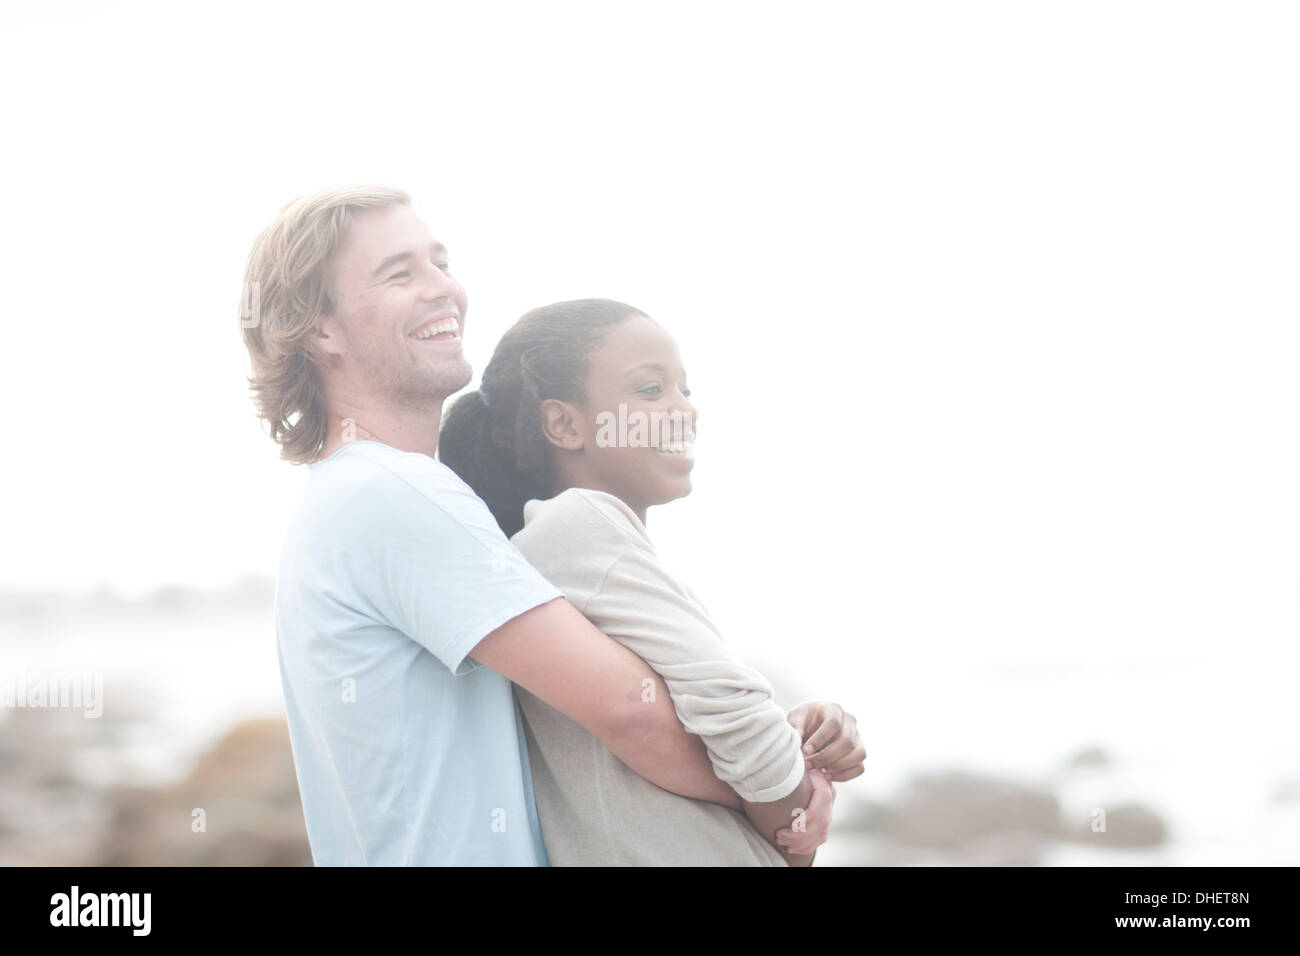 Couple hugging on beach Photo Stock